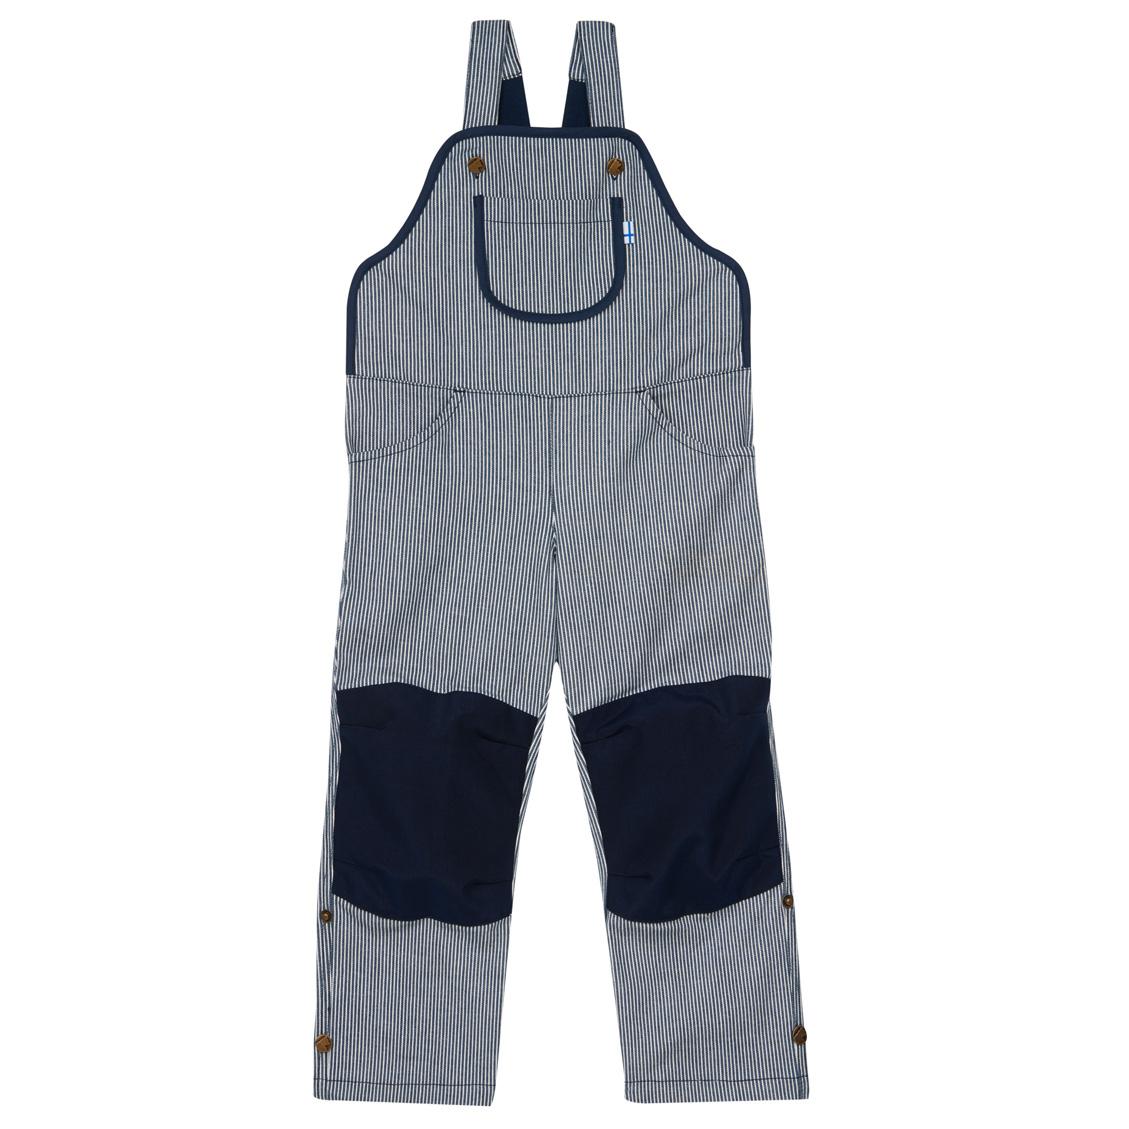 suche nach echtem am billigsten Turnschuhe 2018 Finkid - Kid's Loiri - Jeans - Majolic Striped / Navy | 70/80 (EU)